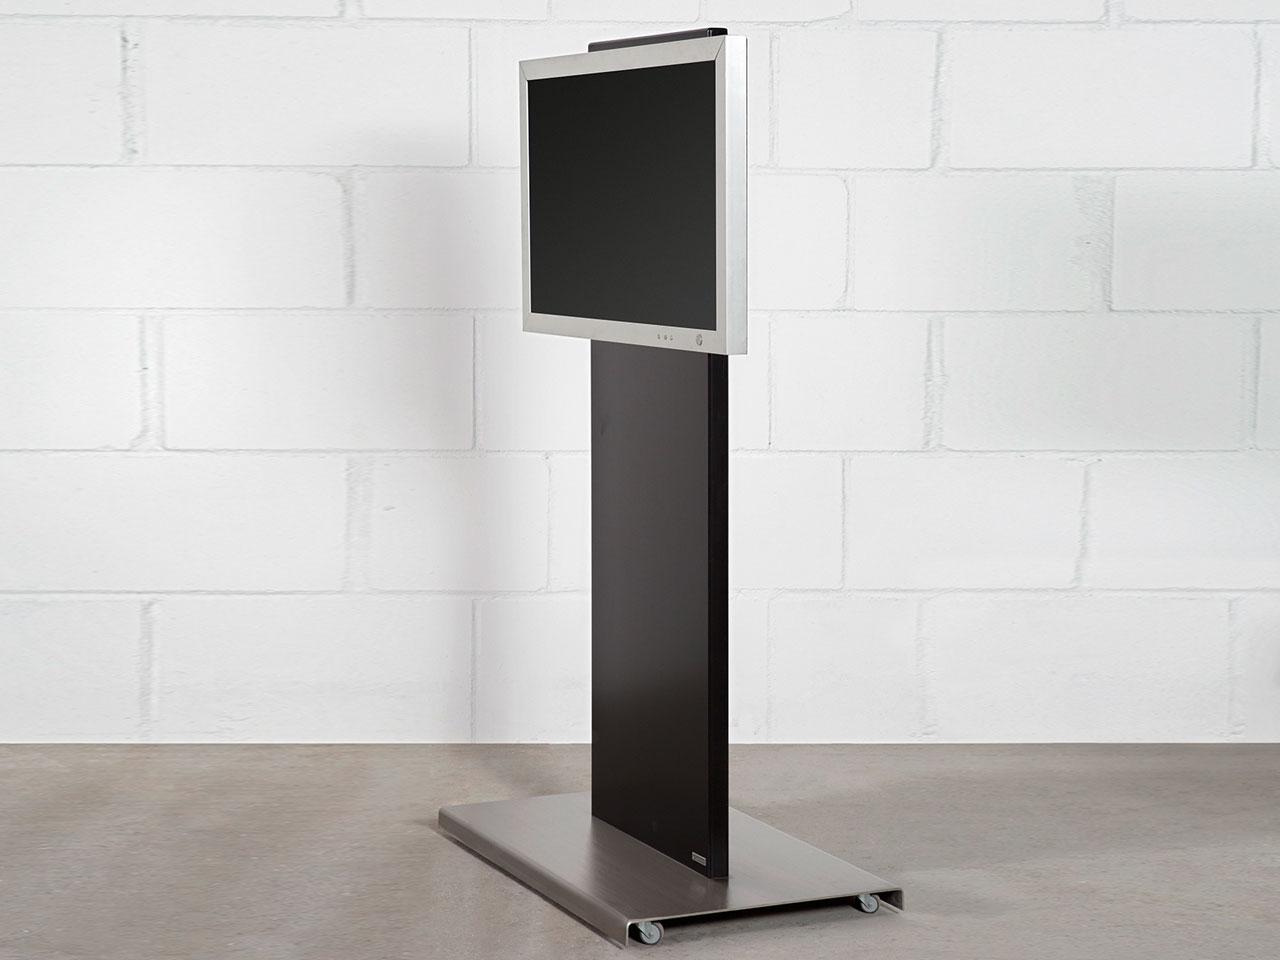 wissmann flat art 135 g nstig kaufen cmb systeme. Black Bedroom Furniture Sets. Home Design Ideas